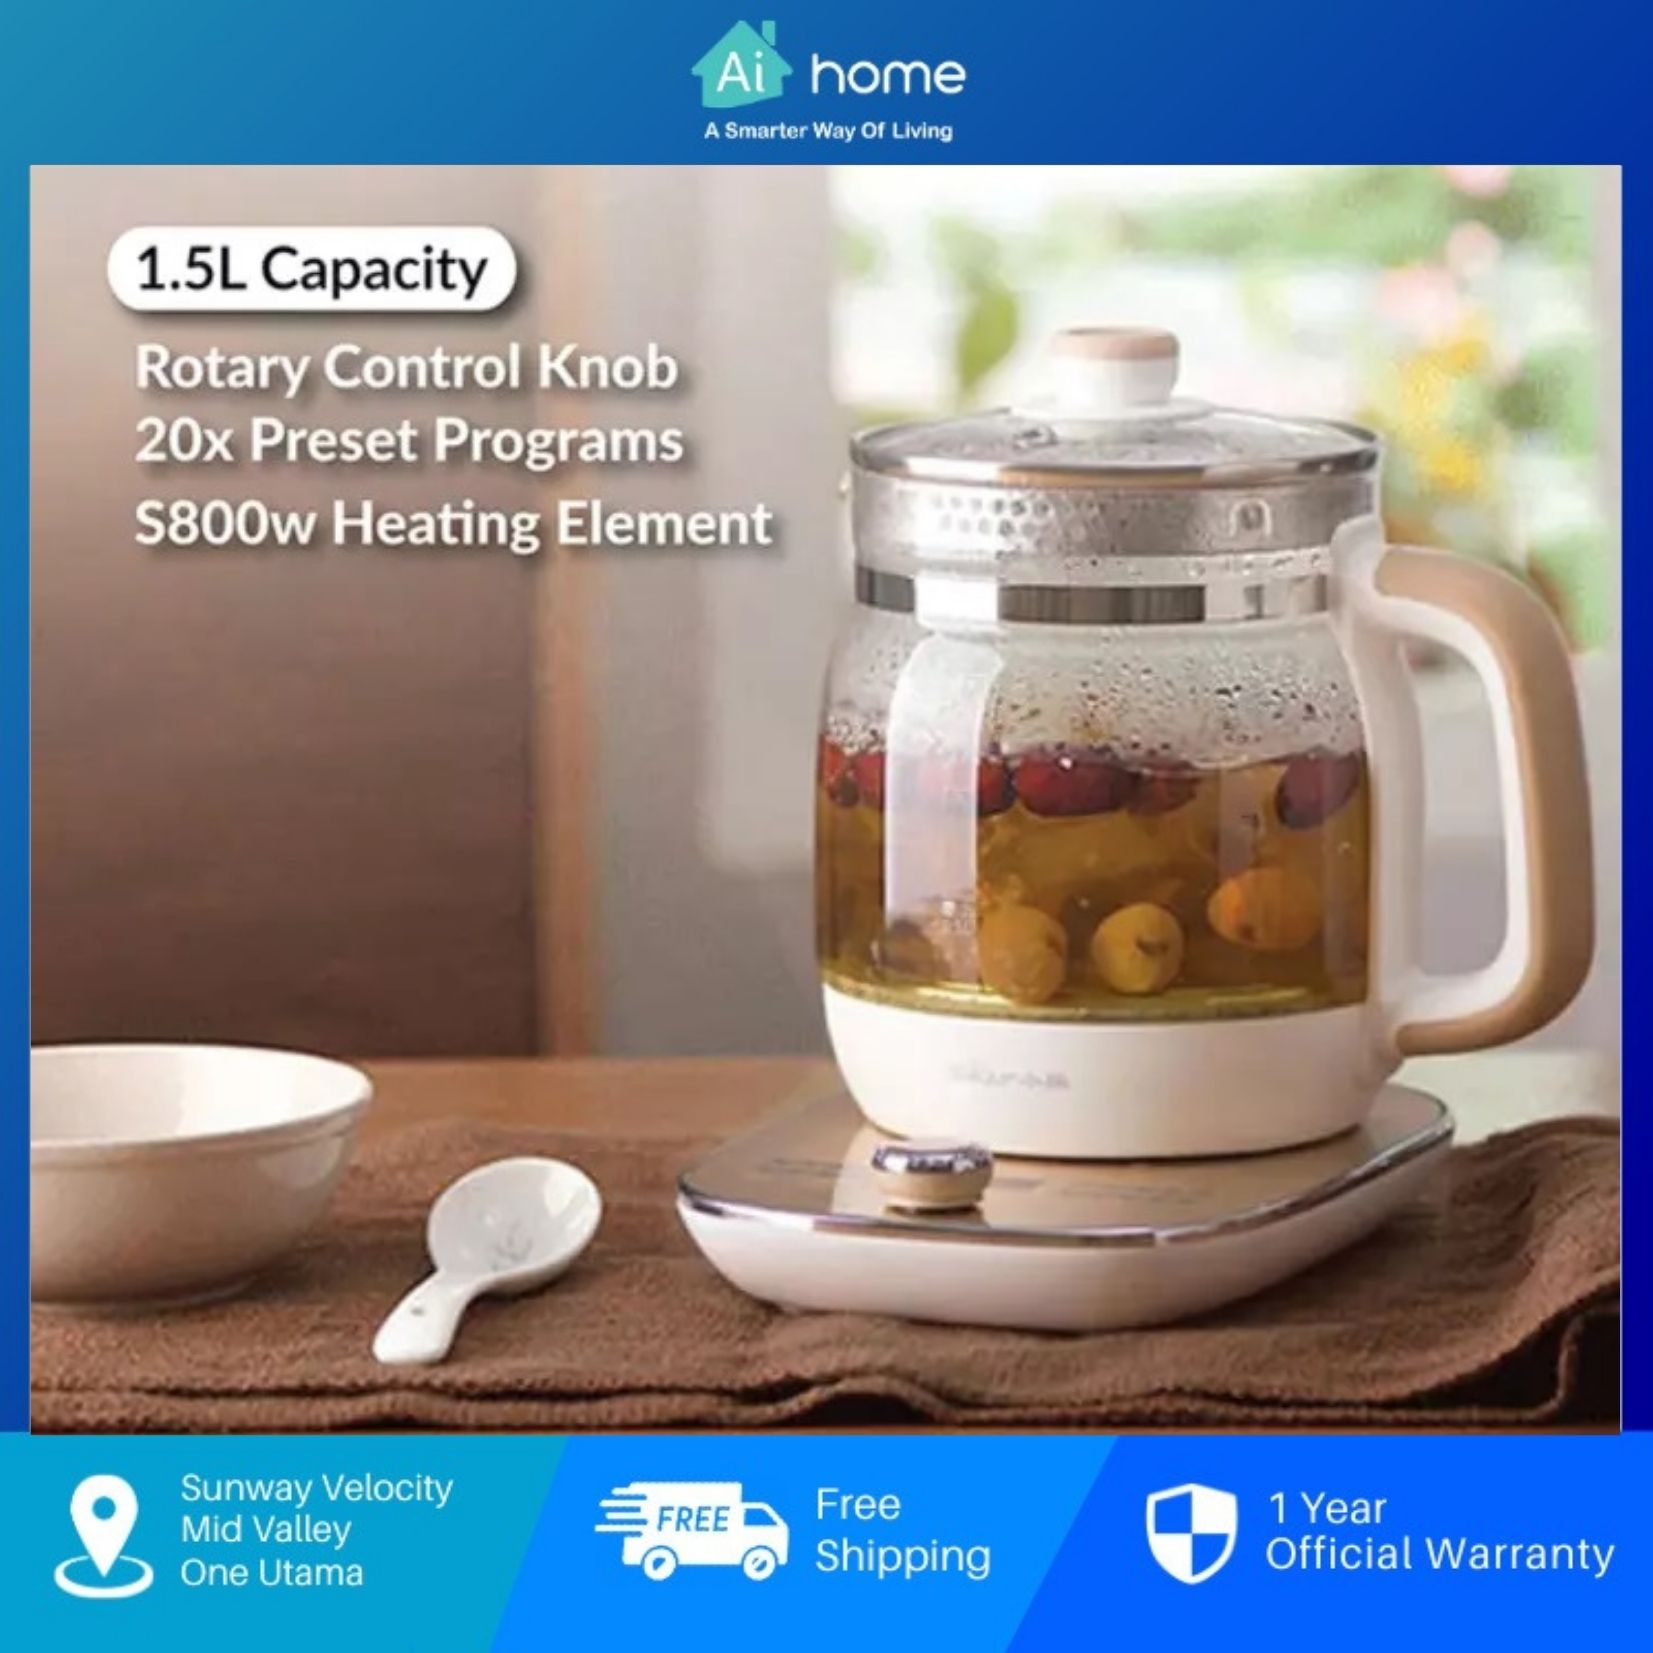 Bear Health Pot 1.5L YSH-A15W6 - Rotary Control Knob | 20 Preset Programs | 800W | 9.5H Time Setting [ Aihome ]